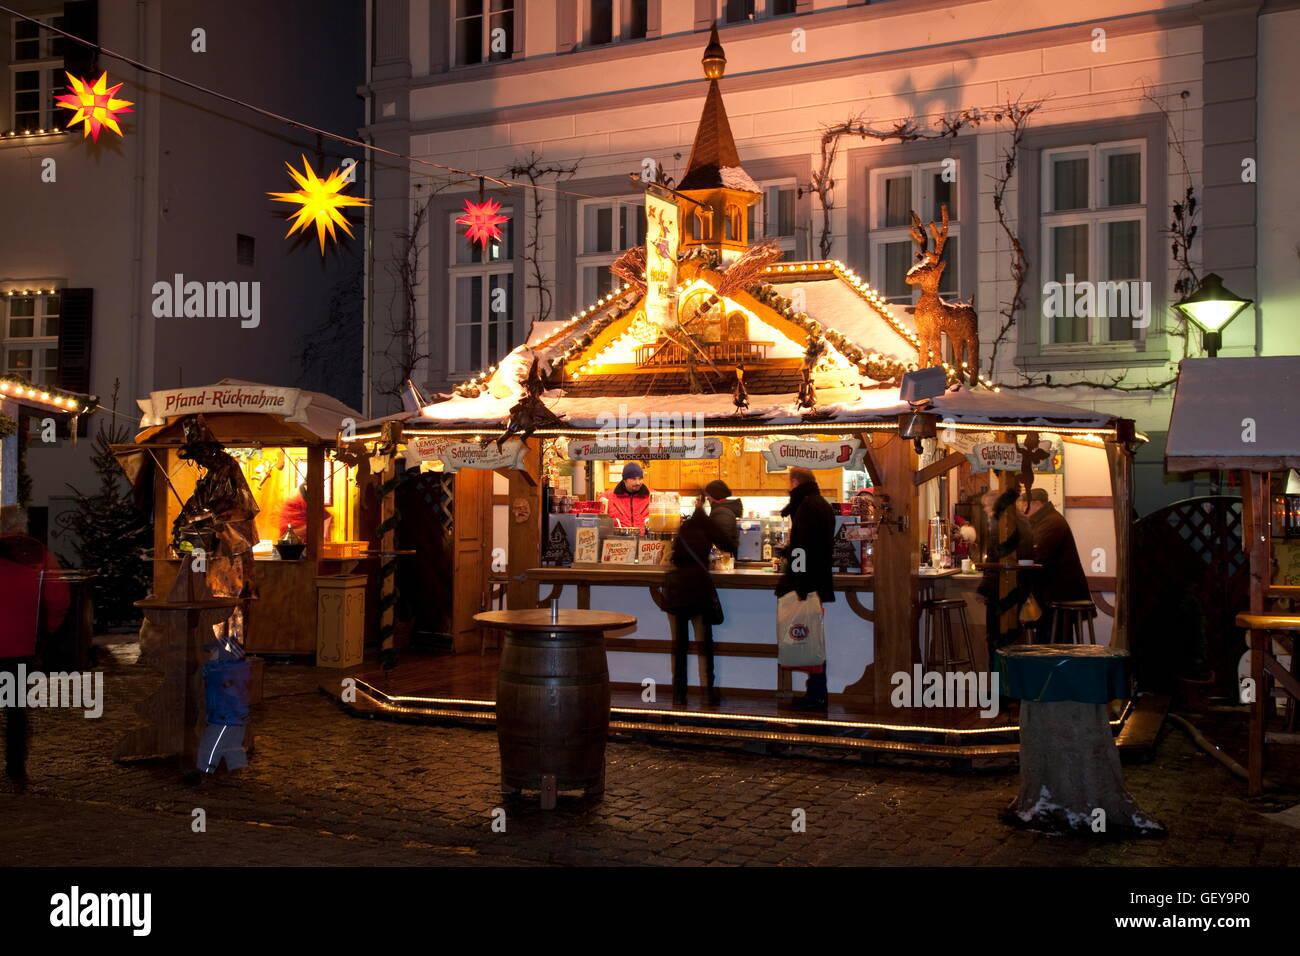 Christmas market, Soest - Stock Image